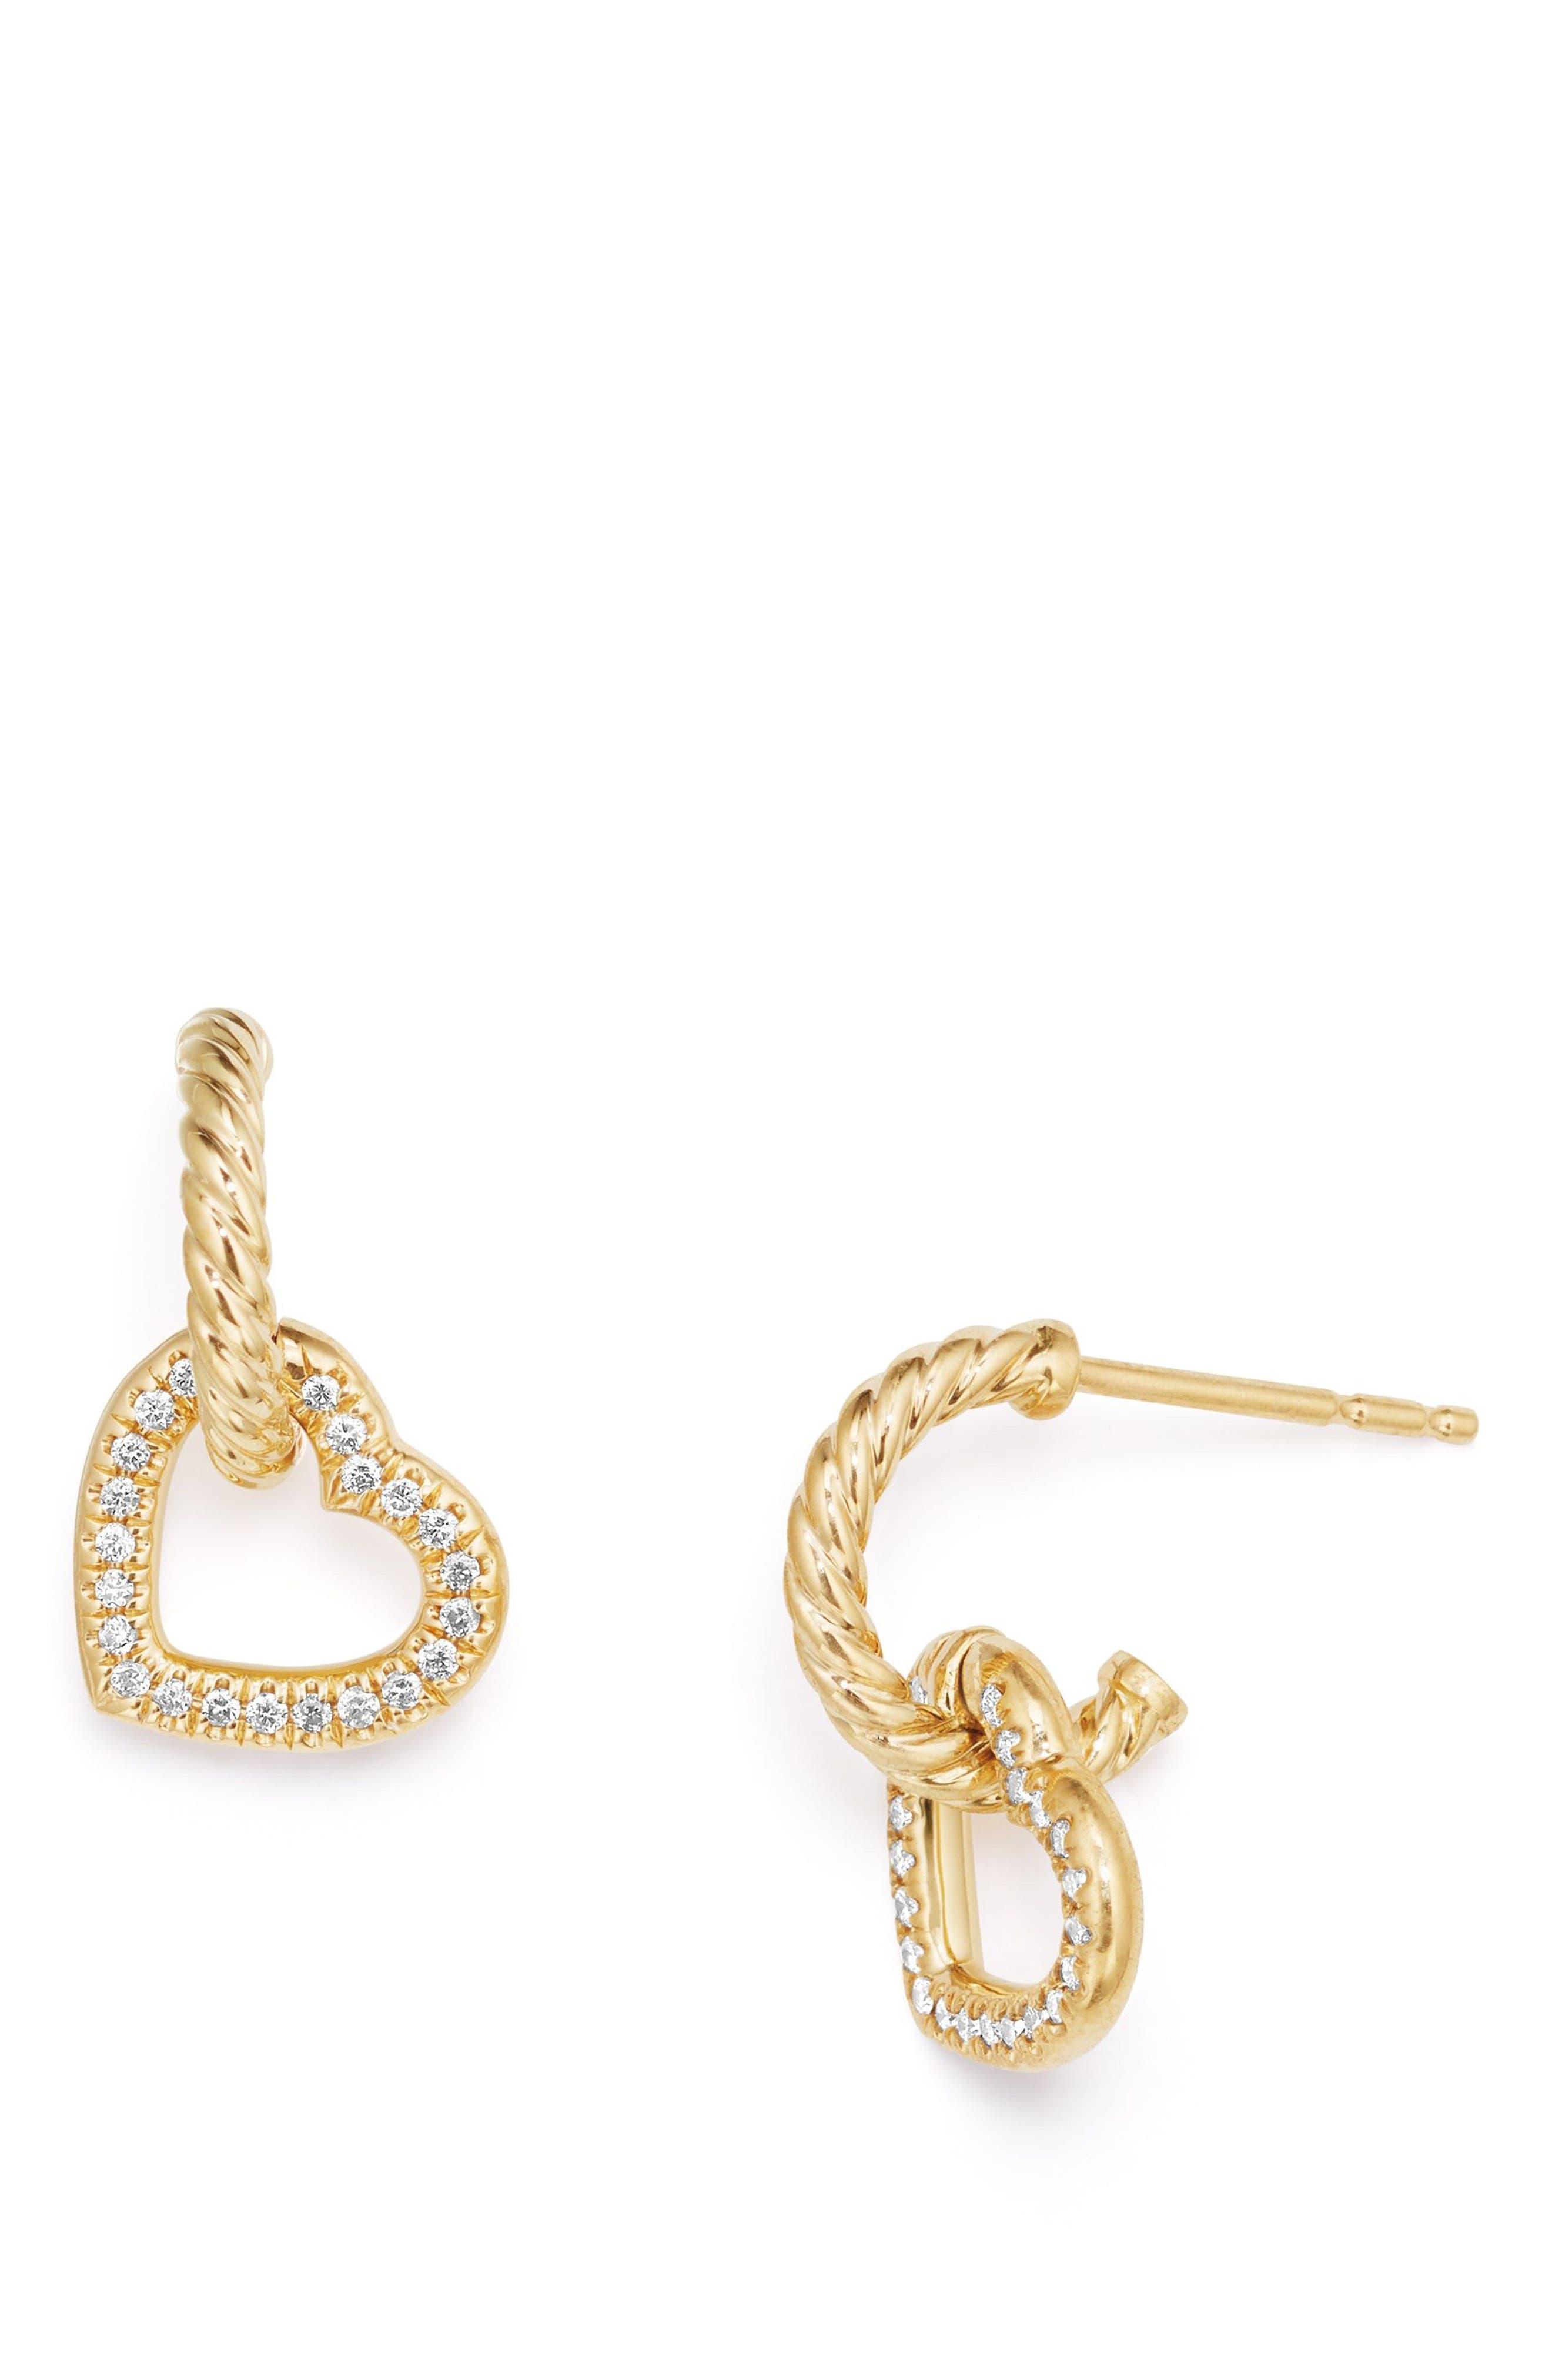 DAVID YURMAN Heart Drop Earrings with Diamonds in 18K Gold, Main, color, GOLD